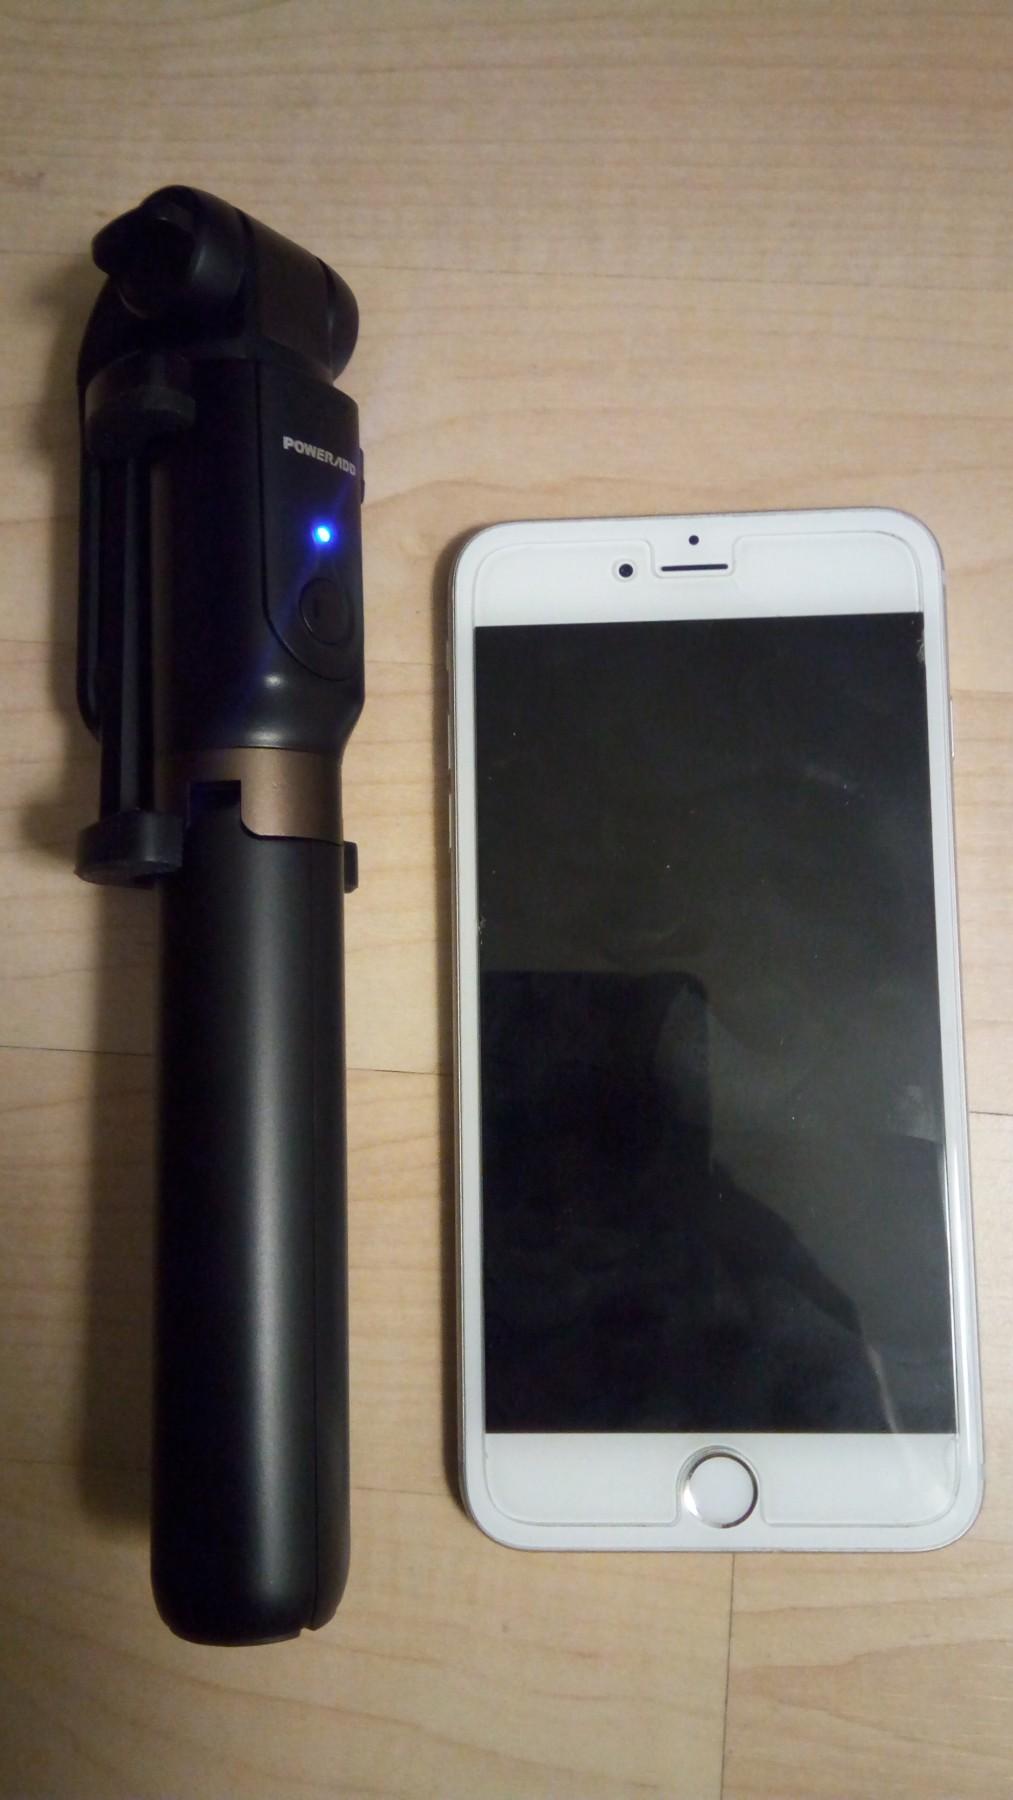 Compact and lightweight selfie stick